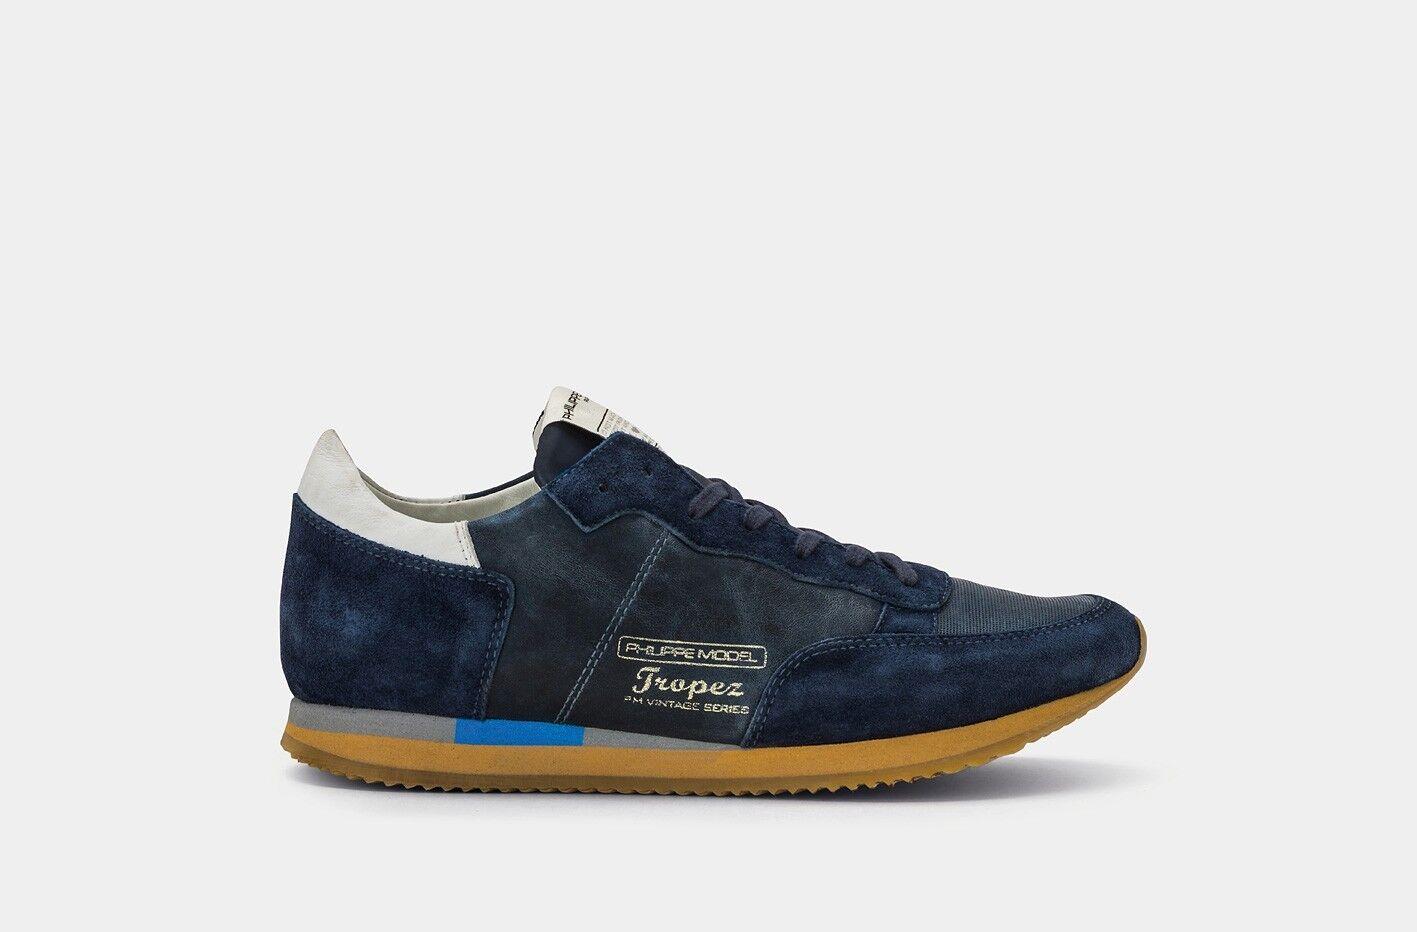 PHILIPPE MODEL scarpe da ginnastica UOMO A/I 18-19 TVLU WW04 BLU